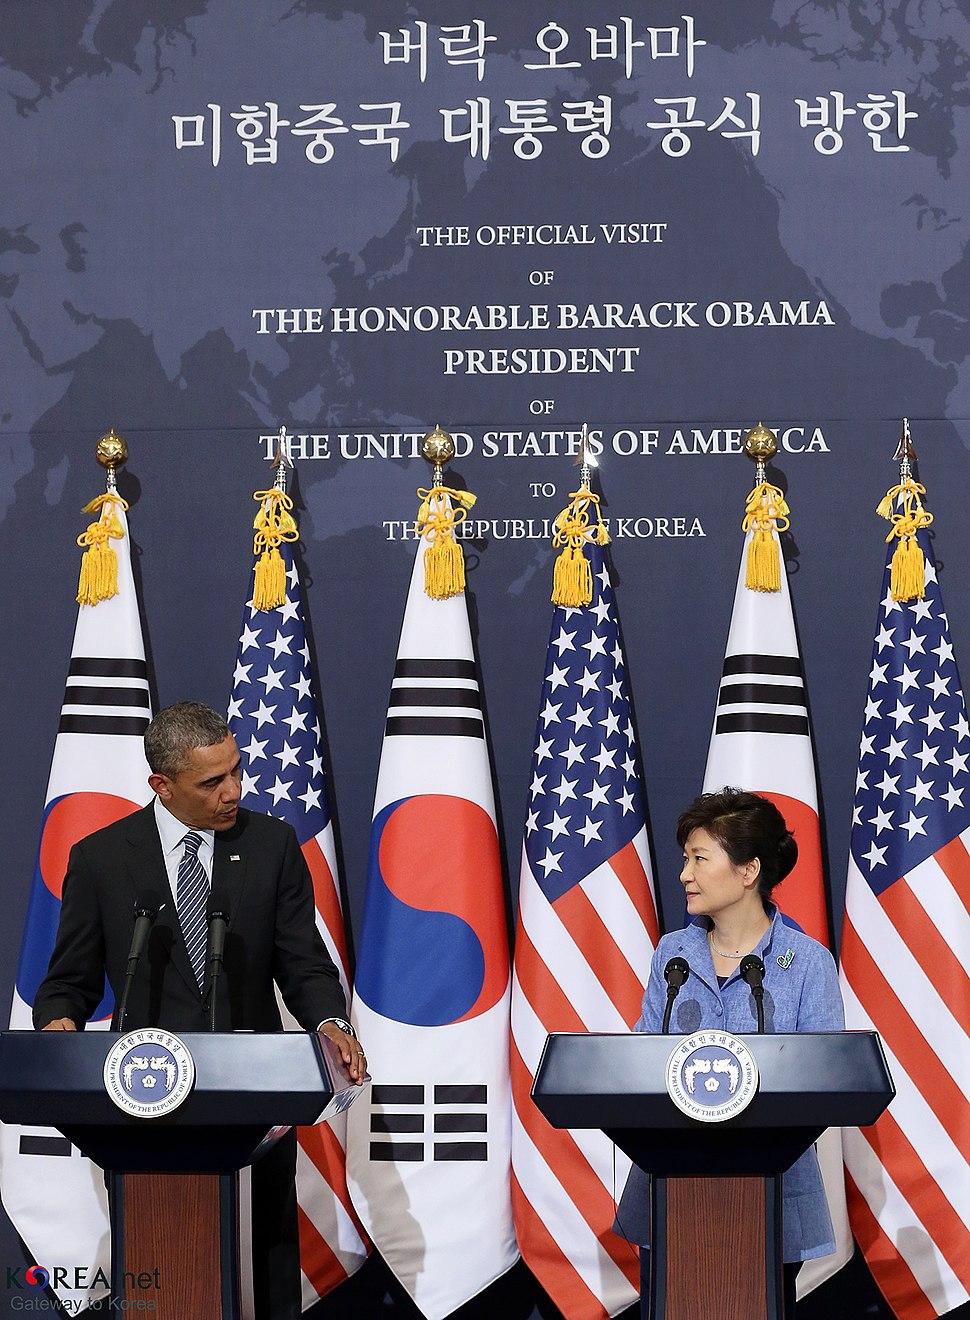 Korea US President Obama Visiting 18 (14045206364)